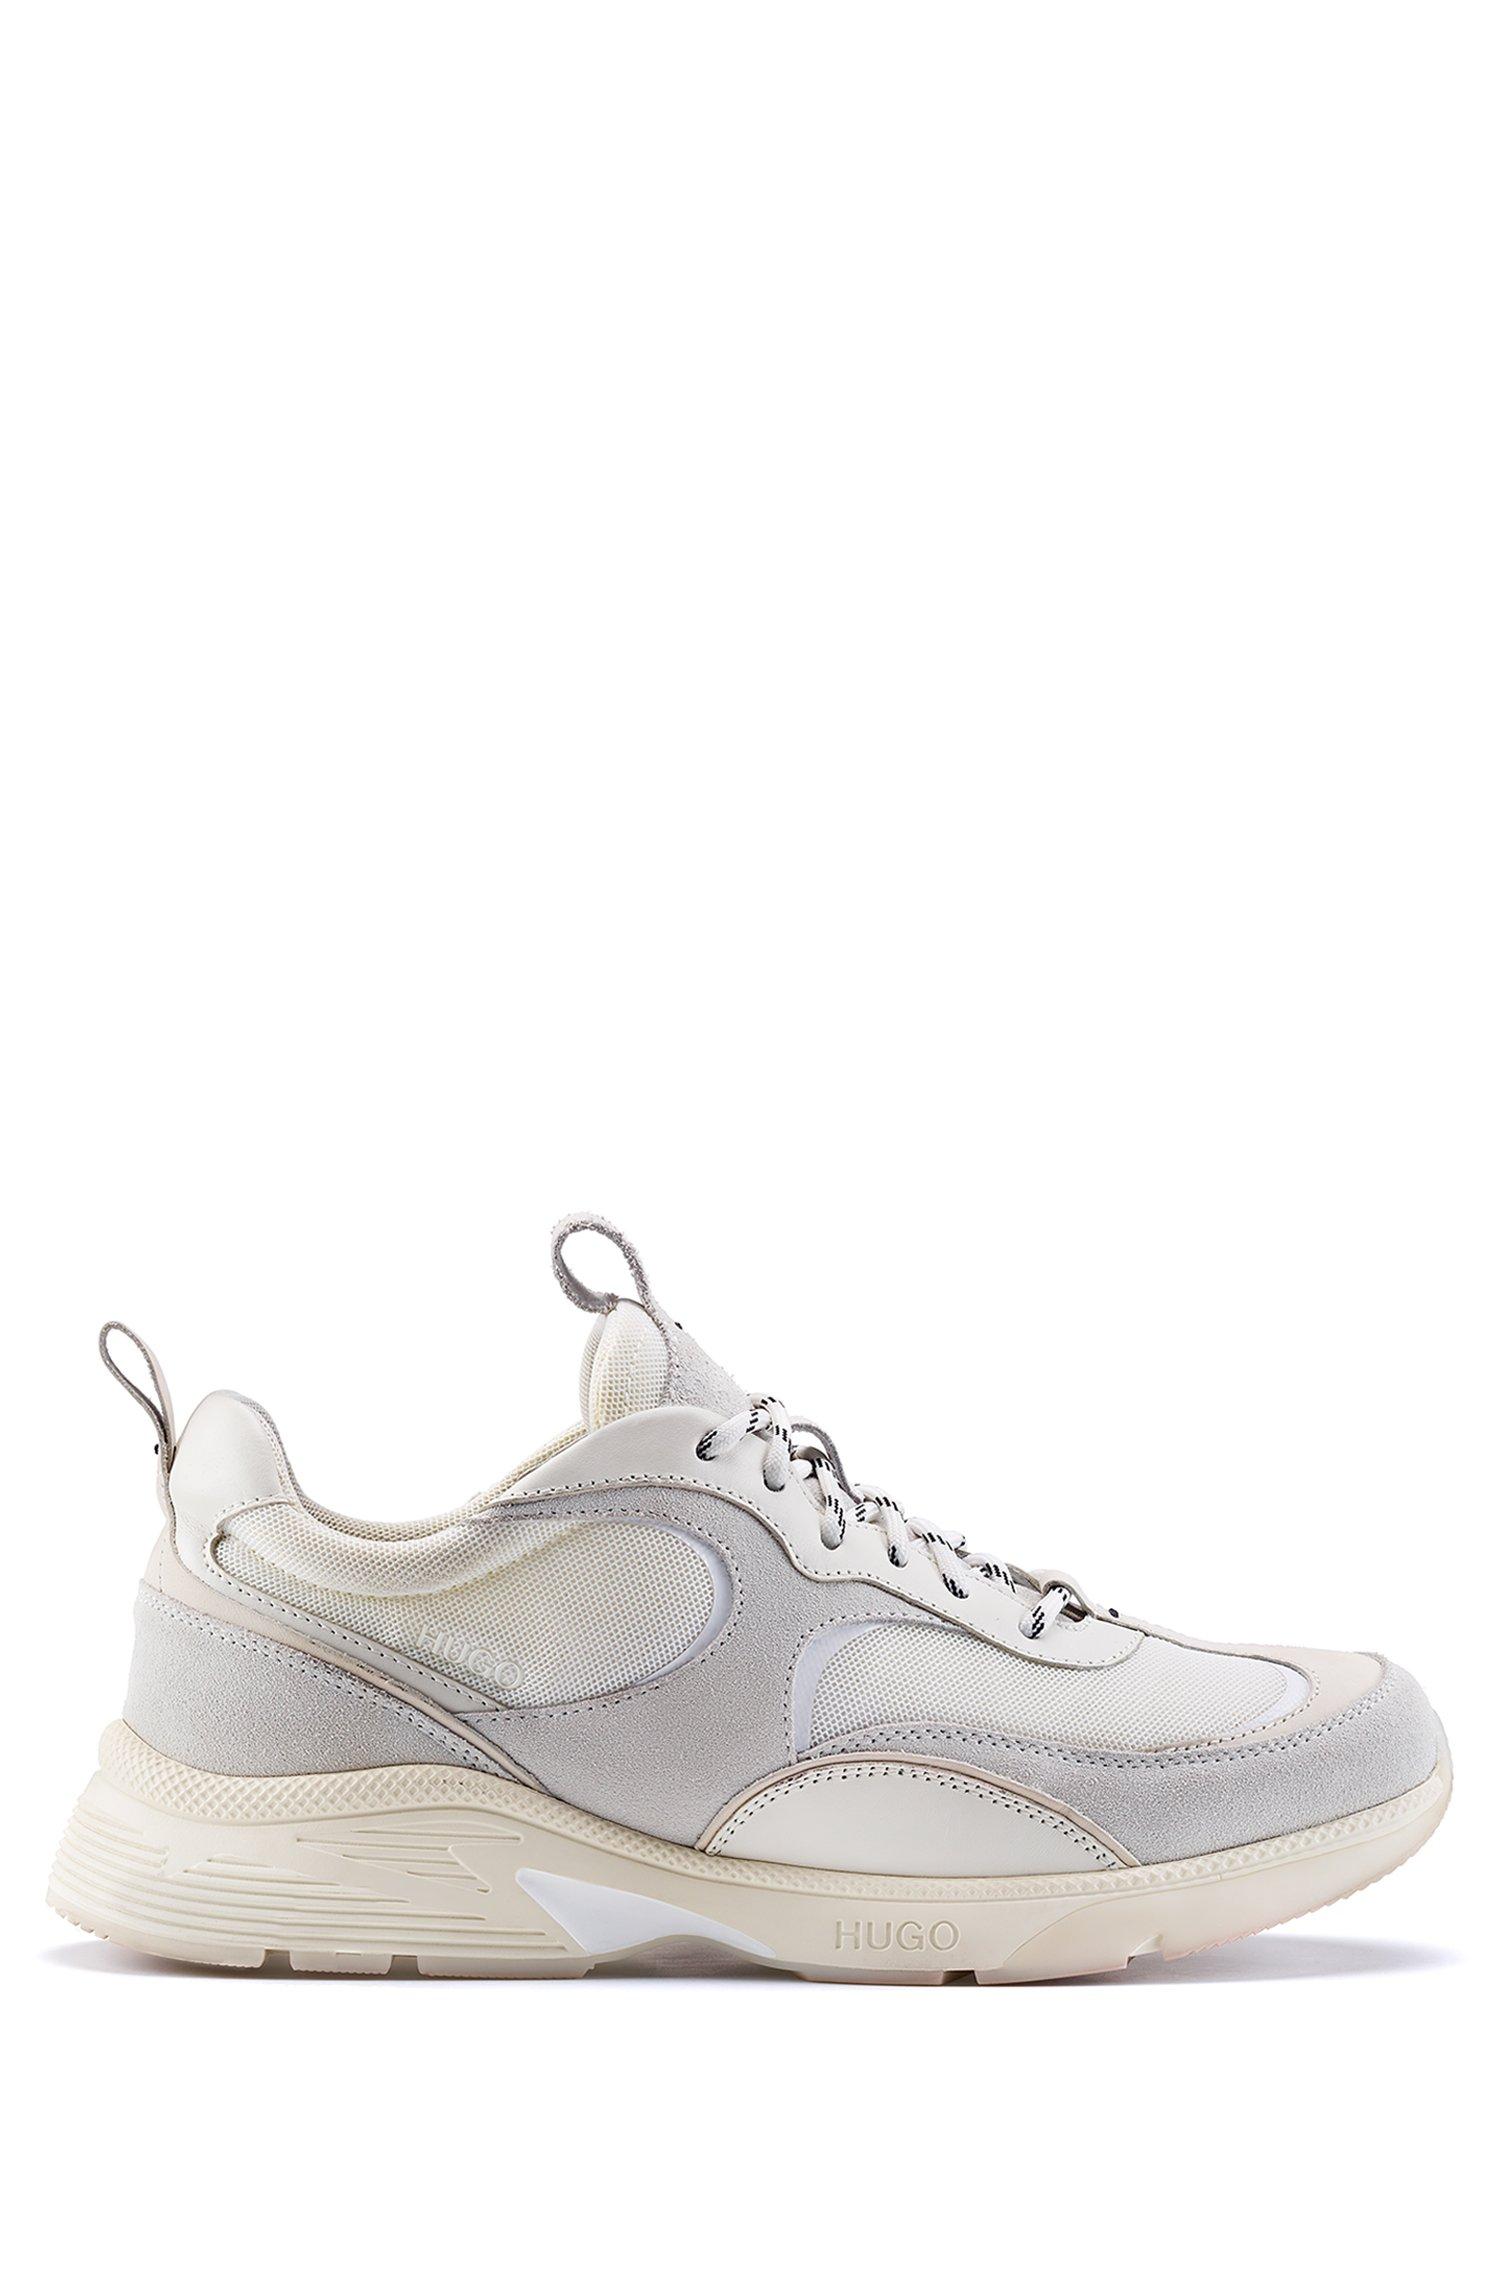 Sneakers stile runner in materiali misti con loghi, Bianco